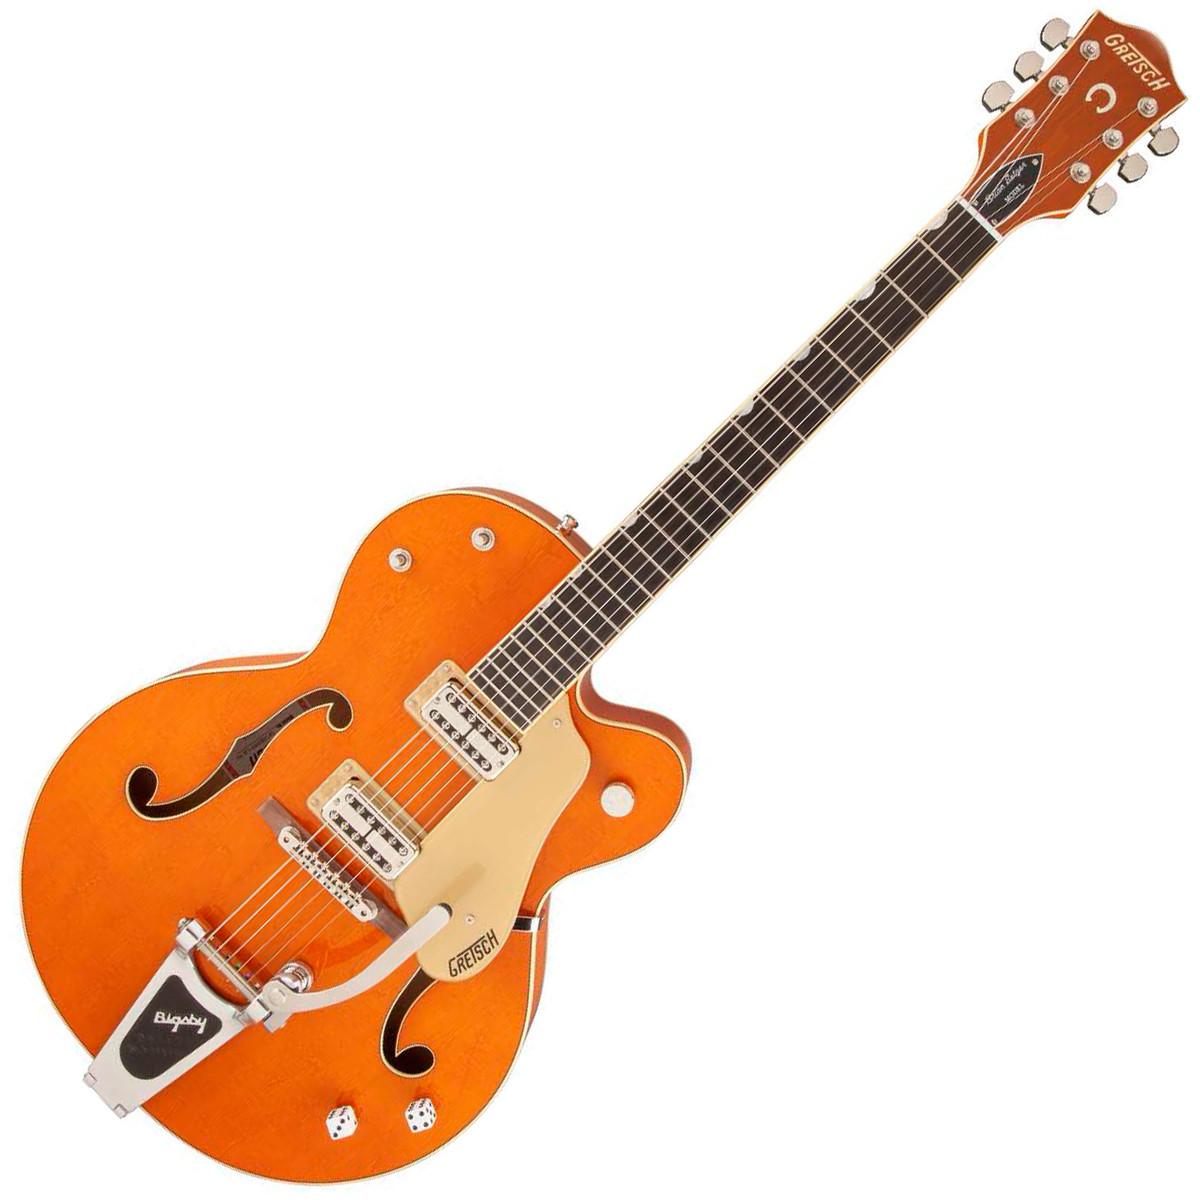 gretsch g6120sslvo brian setzer nashville 3 ply maple orange at gear4music. Black Bedroom Furniture Sets. Home Design Ideas